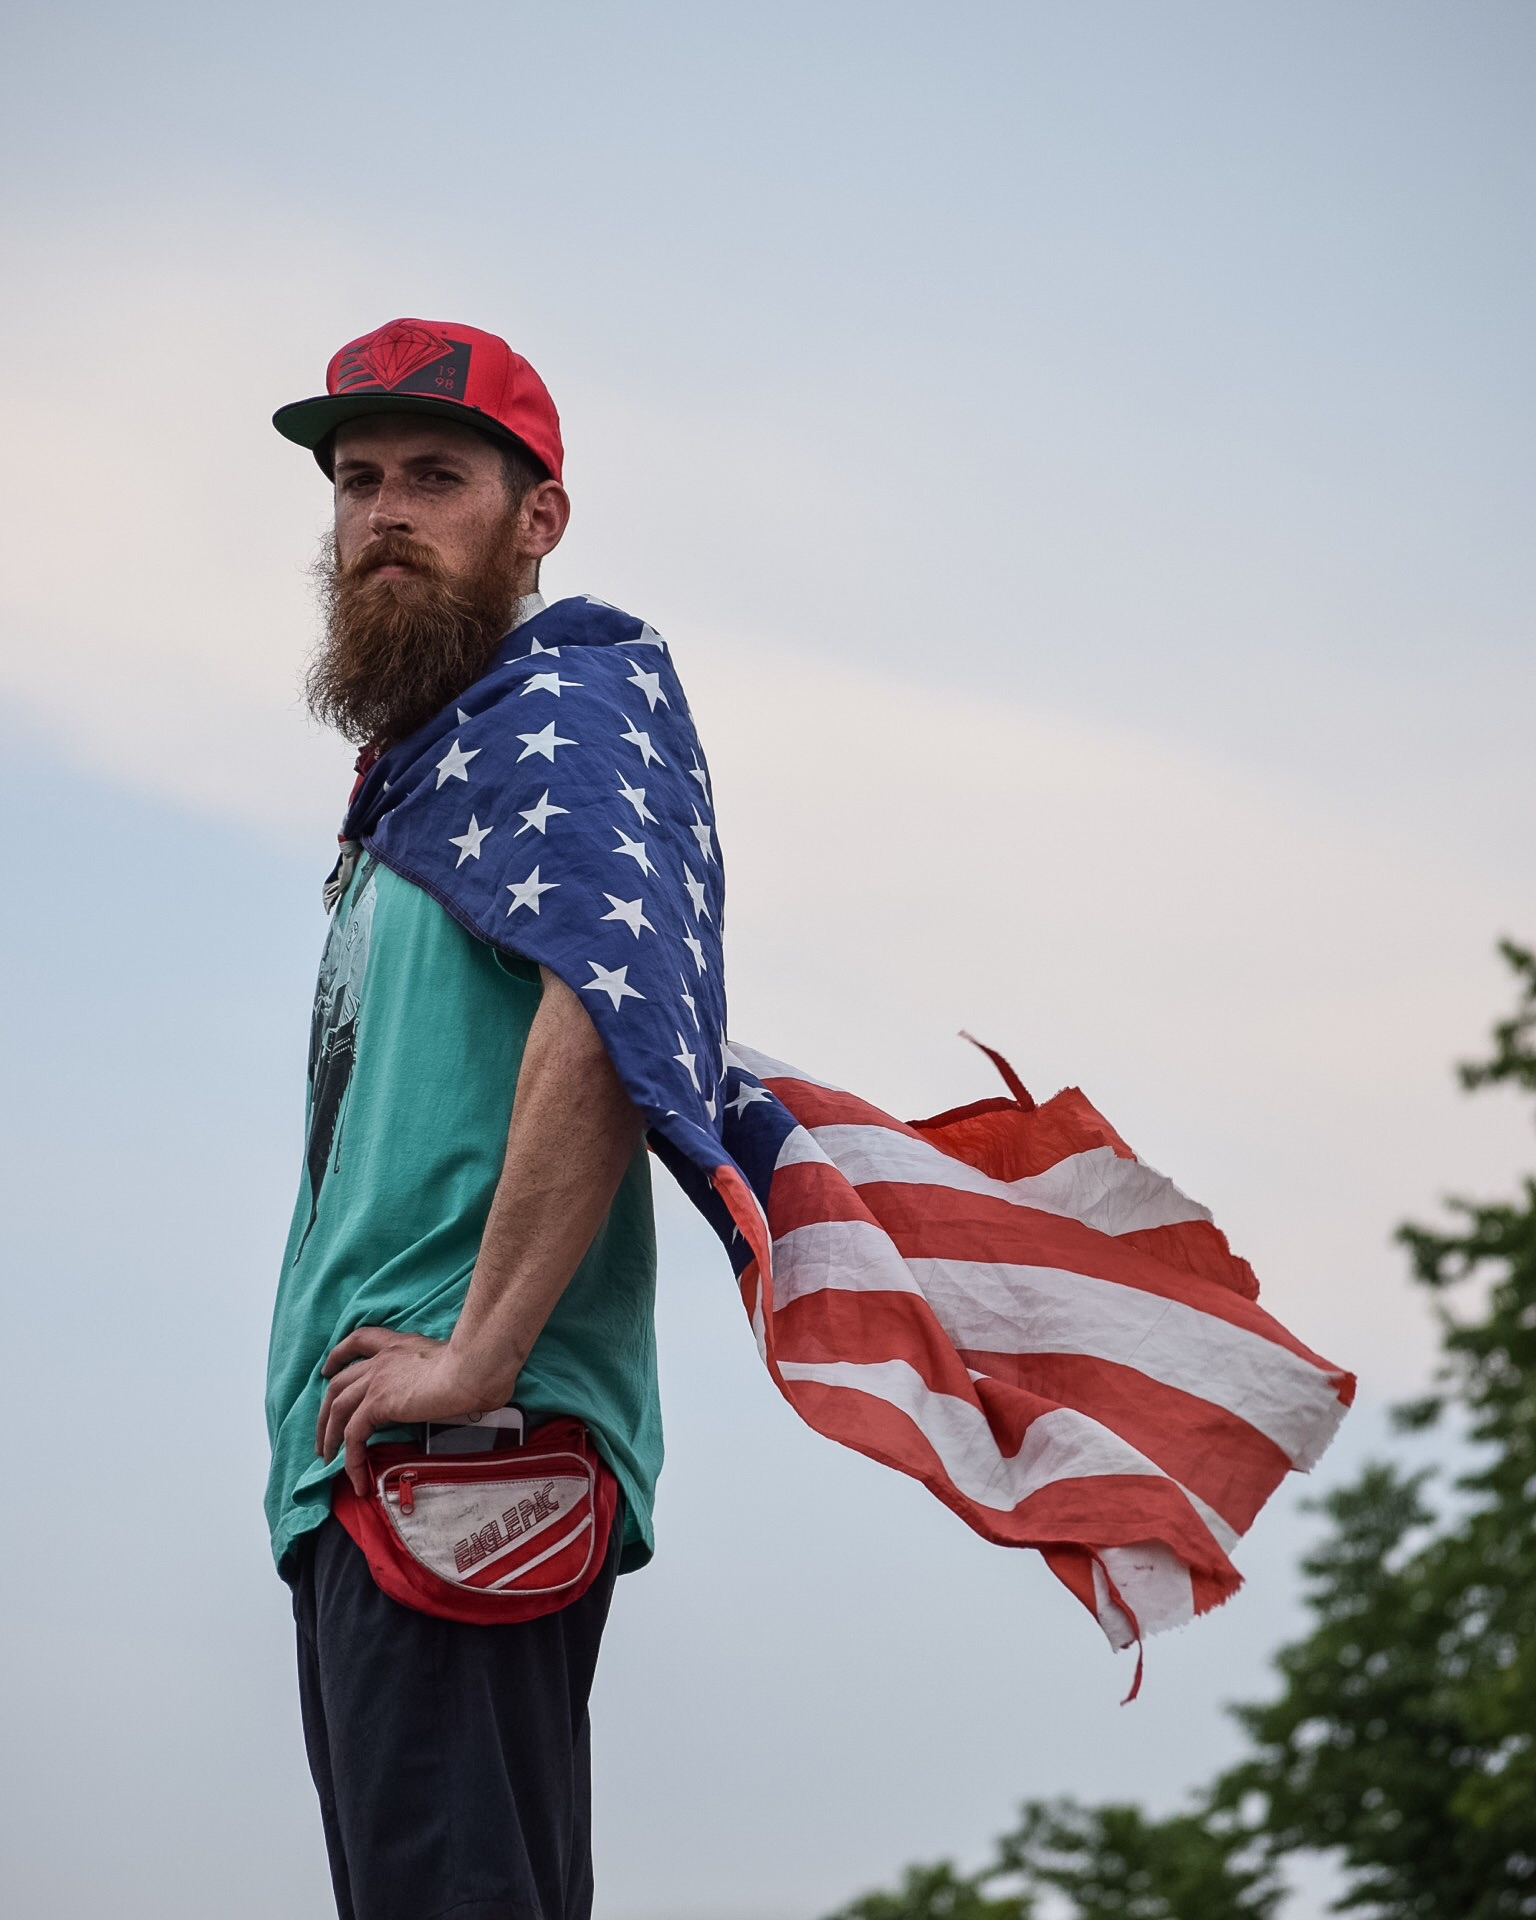 Protestor at the Wells Fargo Center